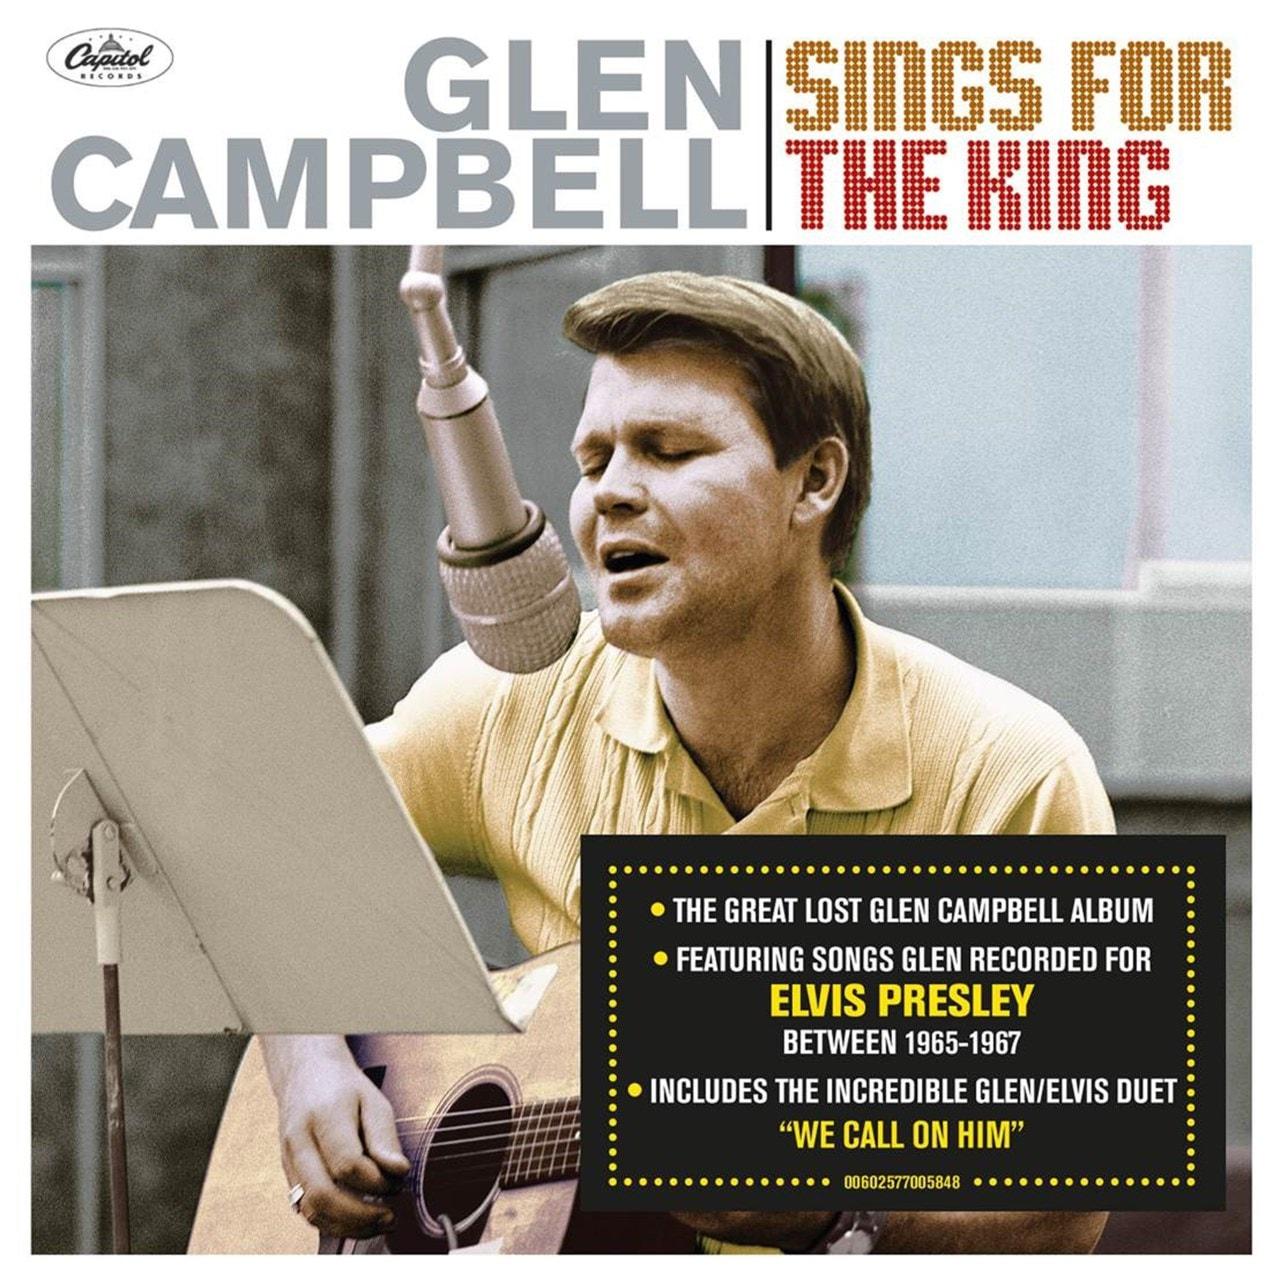 Glen Campbell Sings for the King - 1